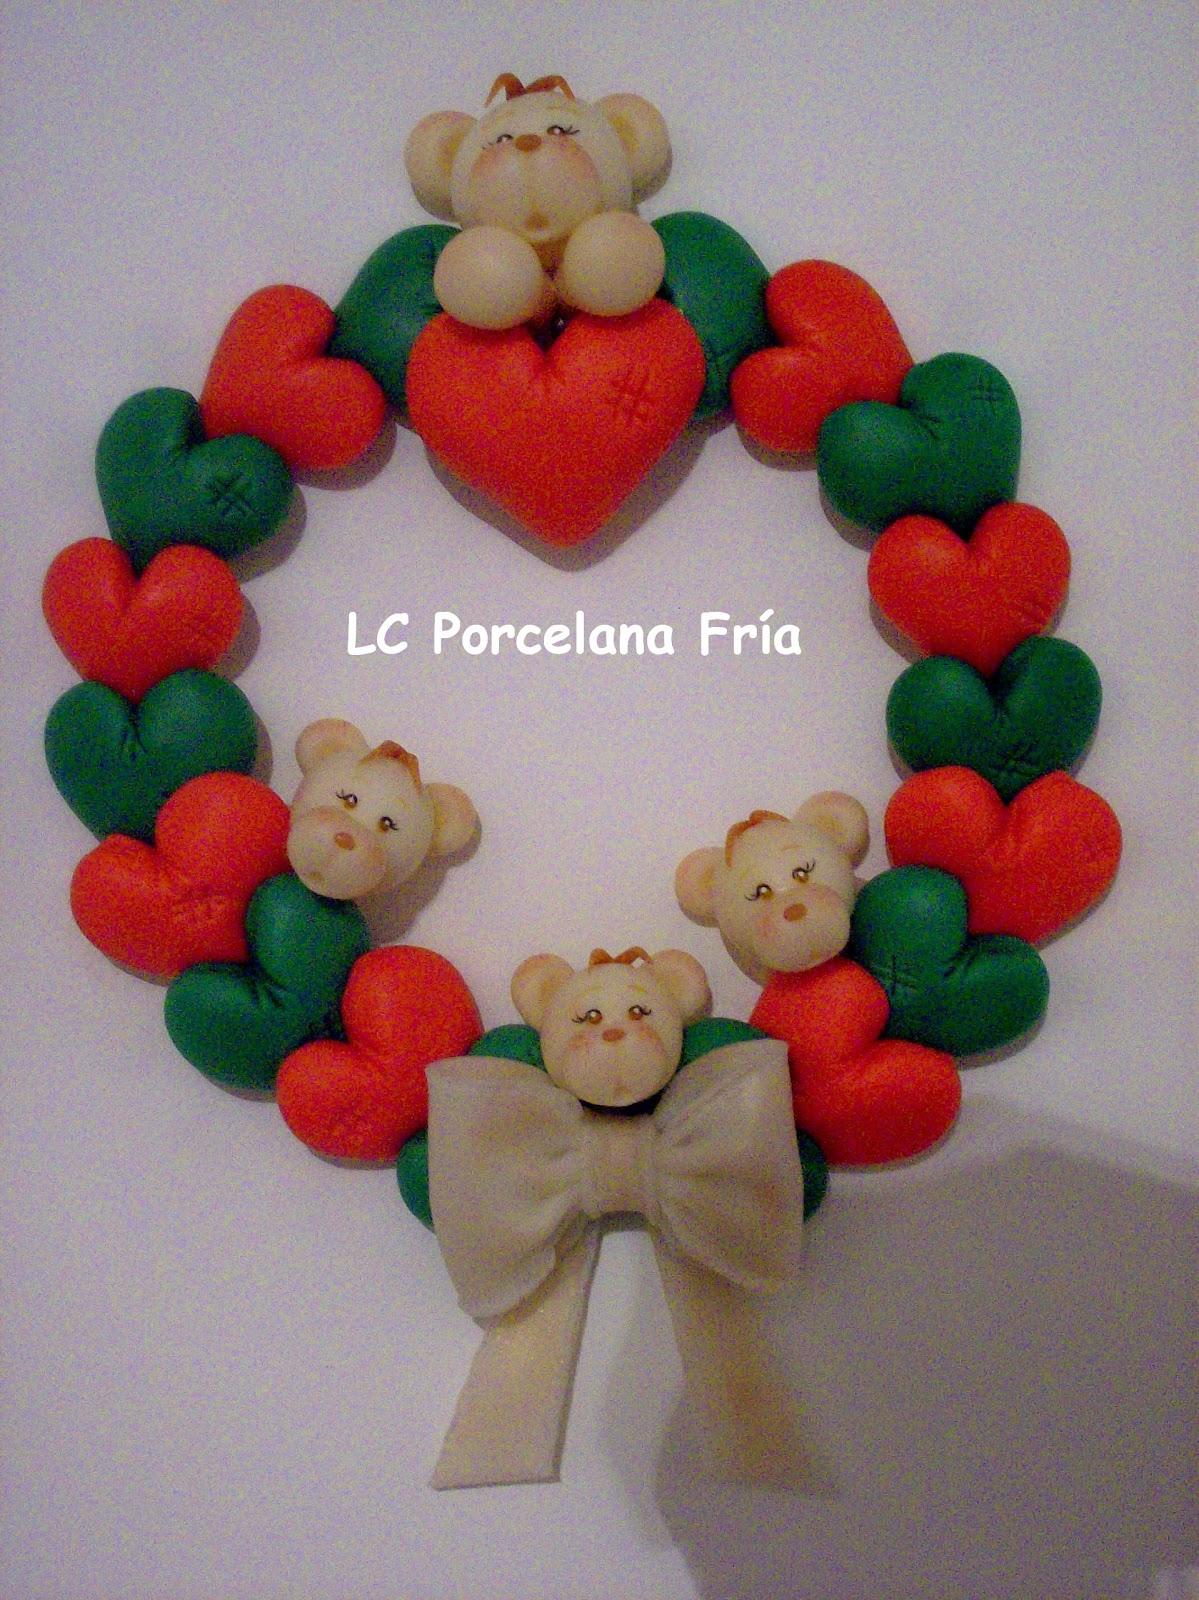 Lc porcelana fr a feliz navidad for Adornos navidenos en porcelana fria utilisima